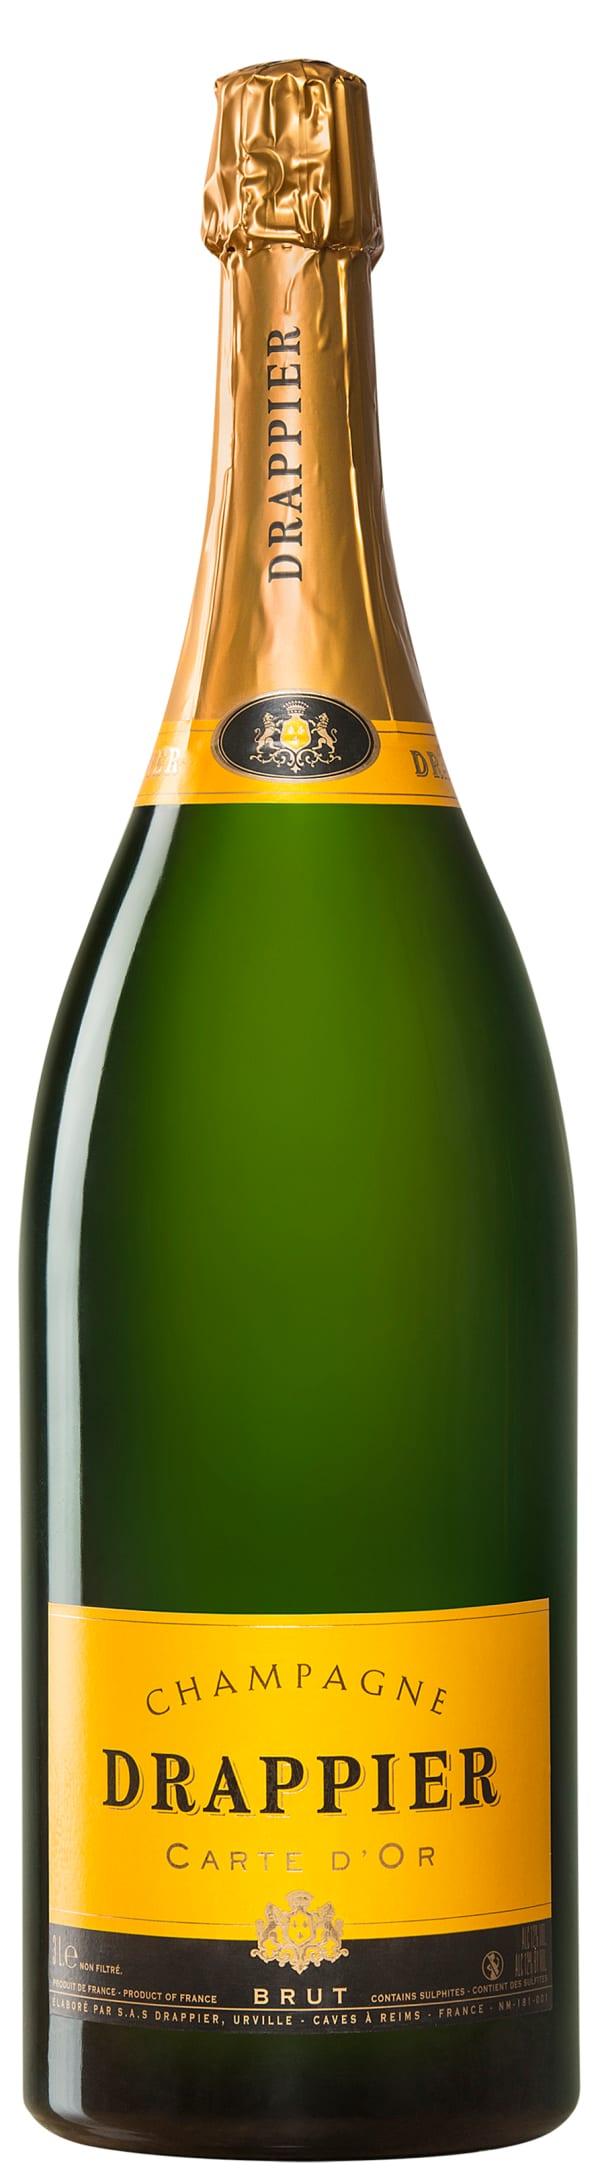 Drappier Carte d'Or Champagne Brut Jeroboam